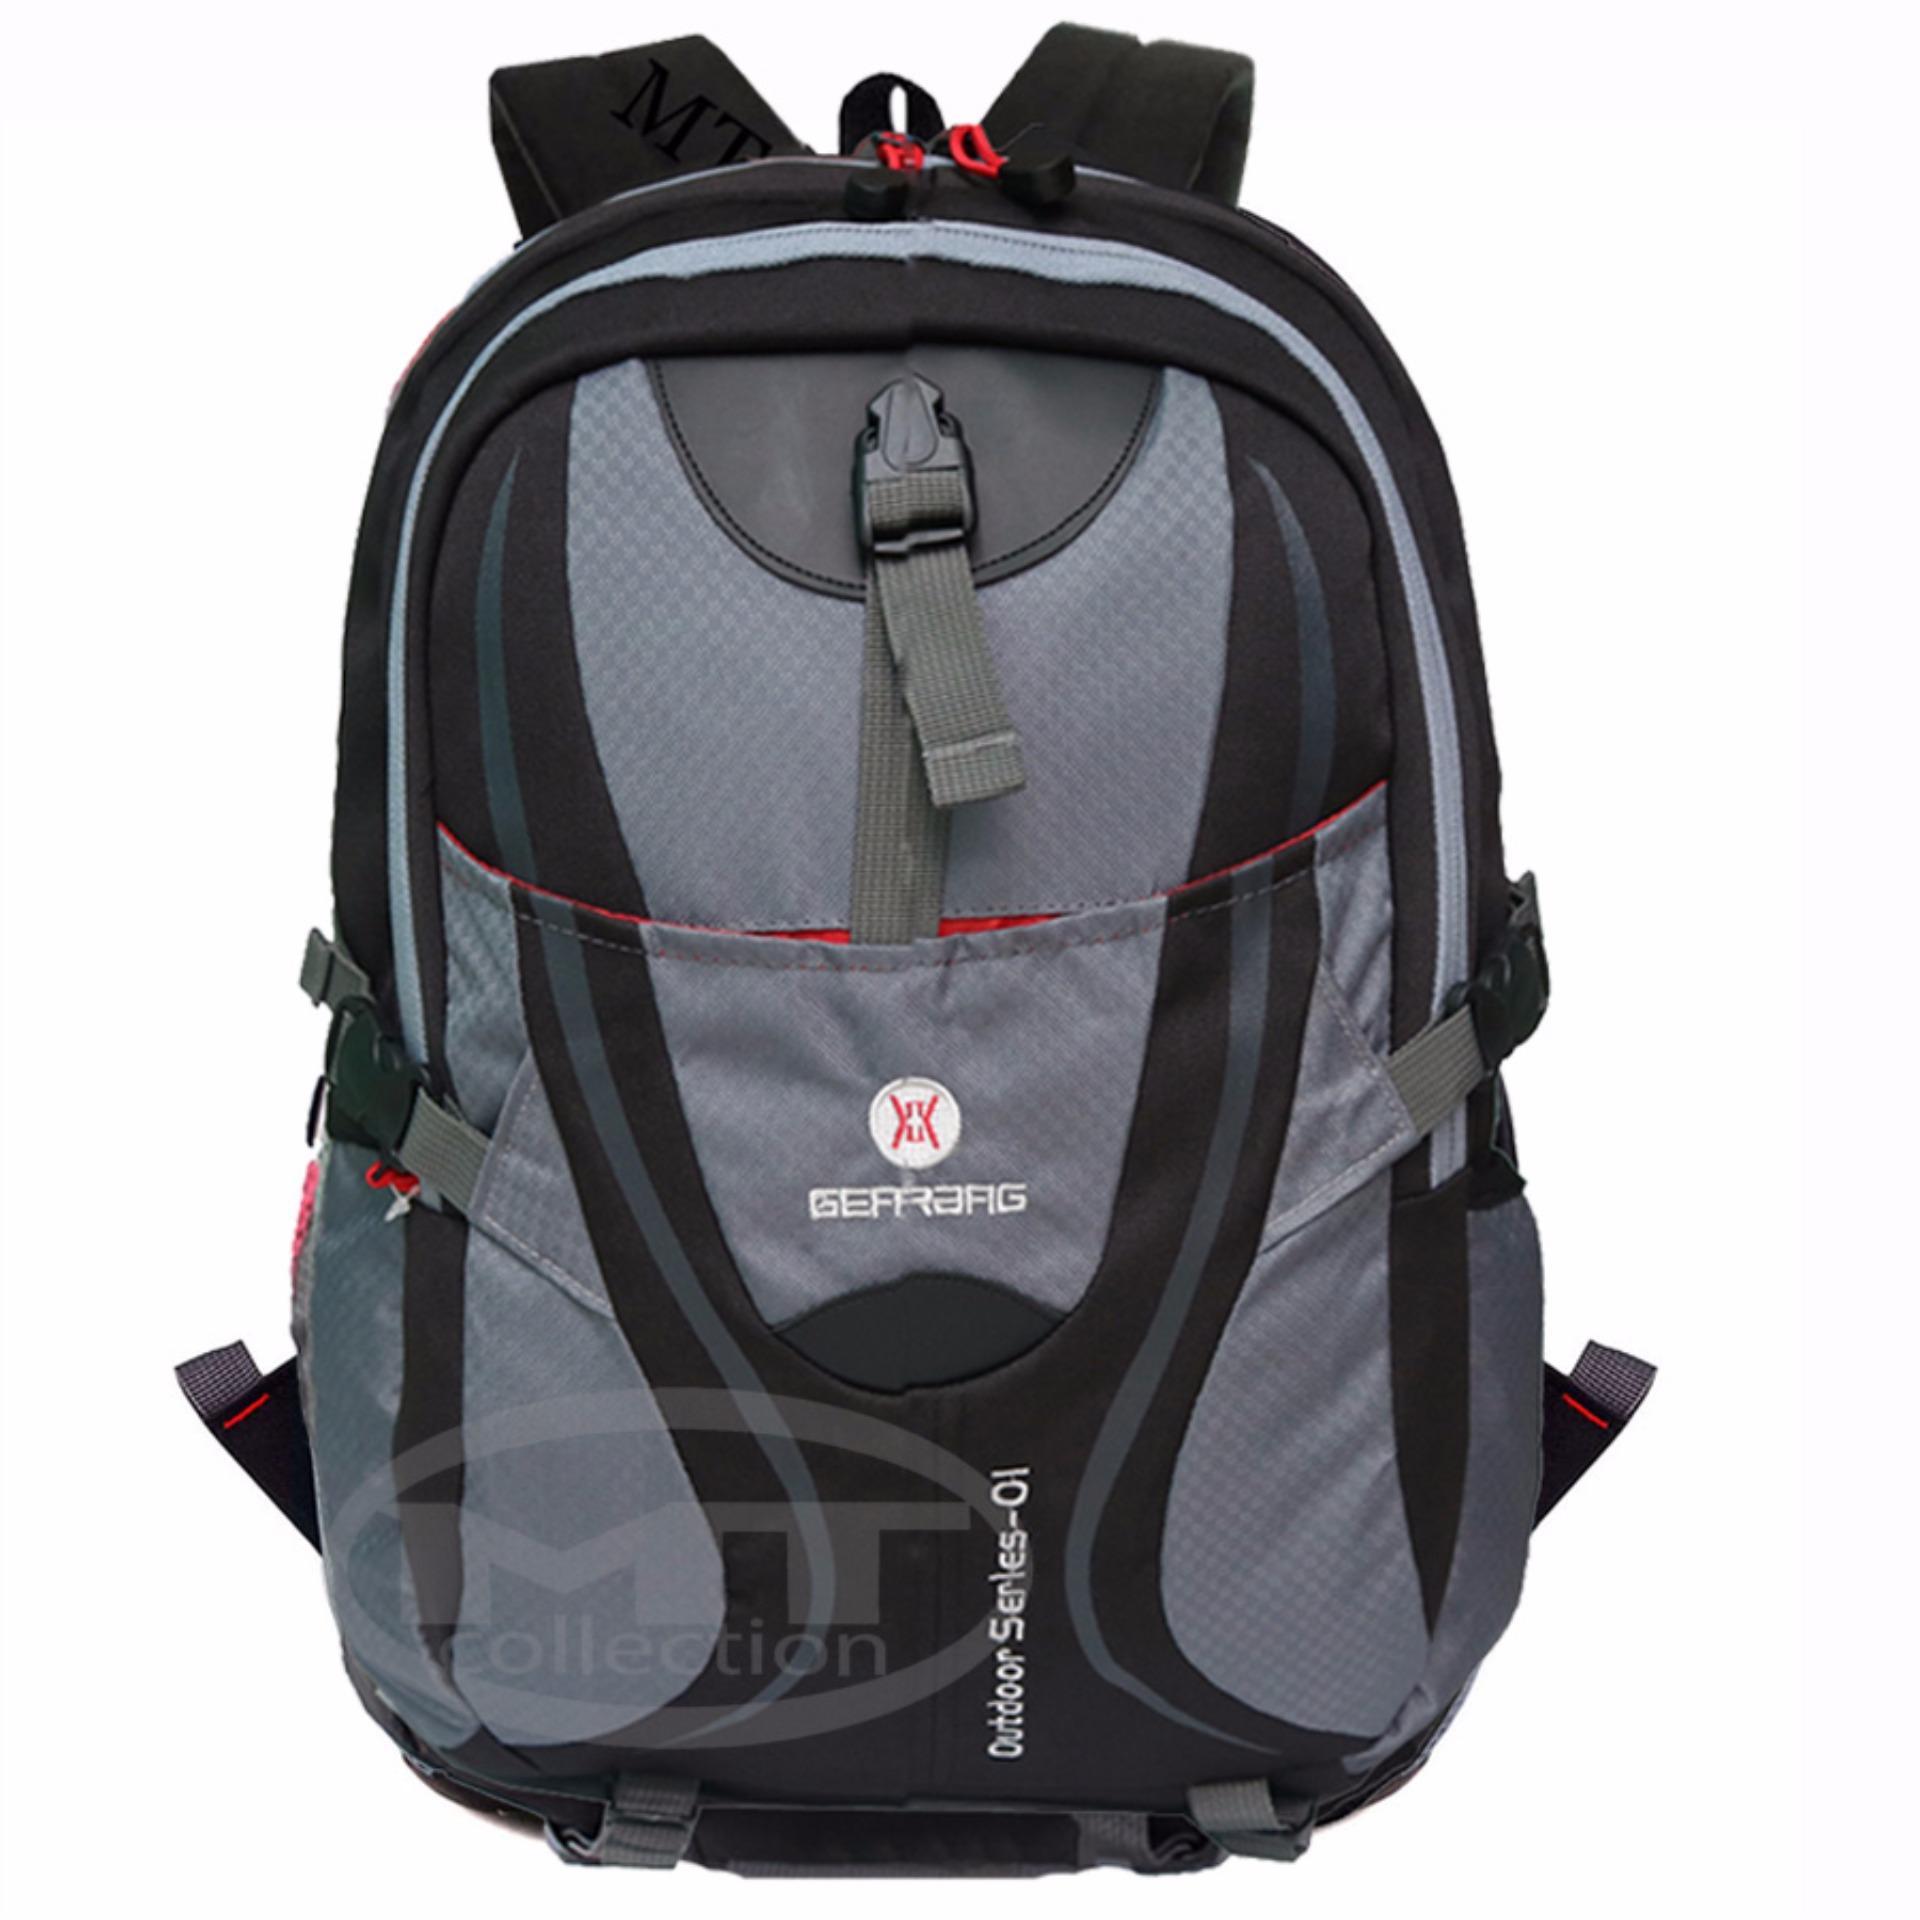 Gear Bag Outdor Series-01 - Tas Ransel Backpack Original Free Raincover